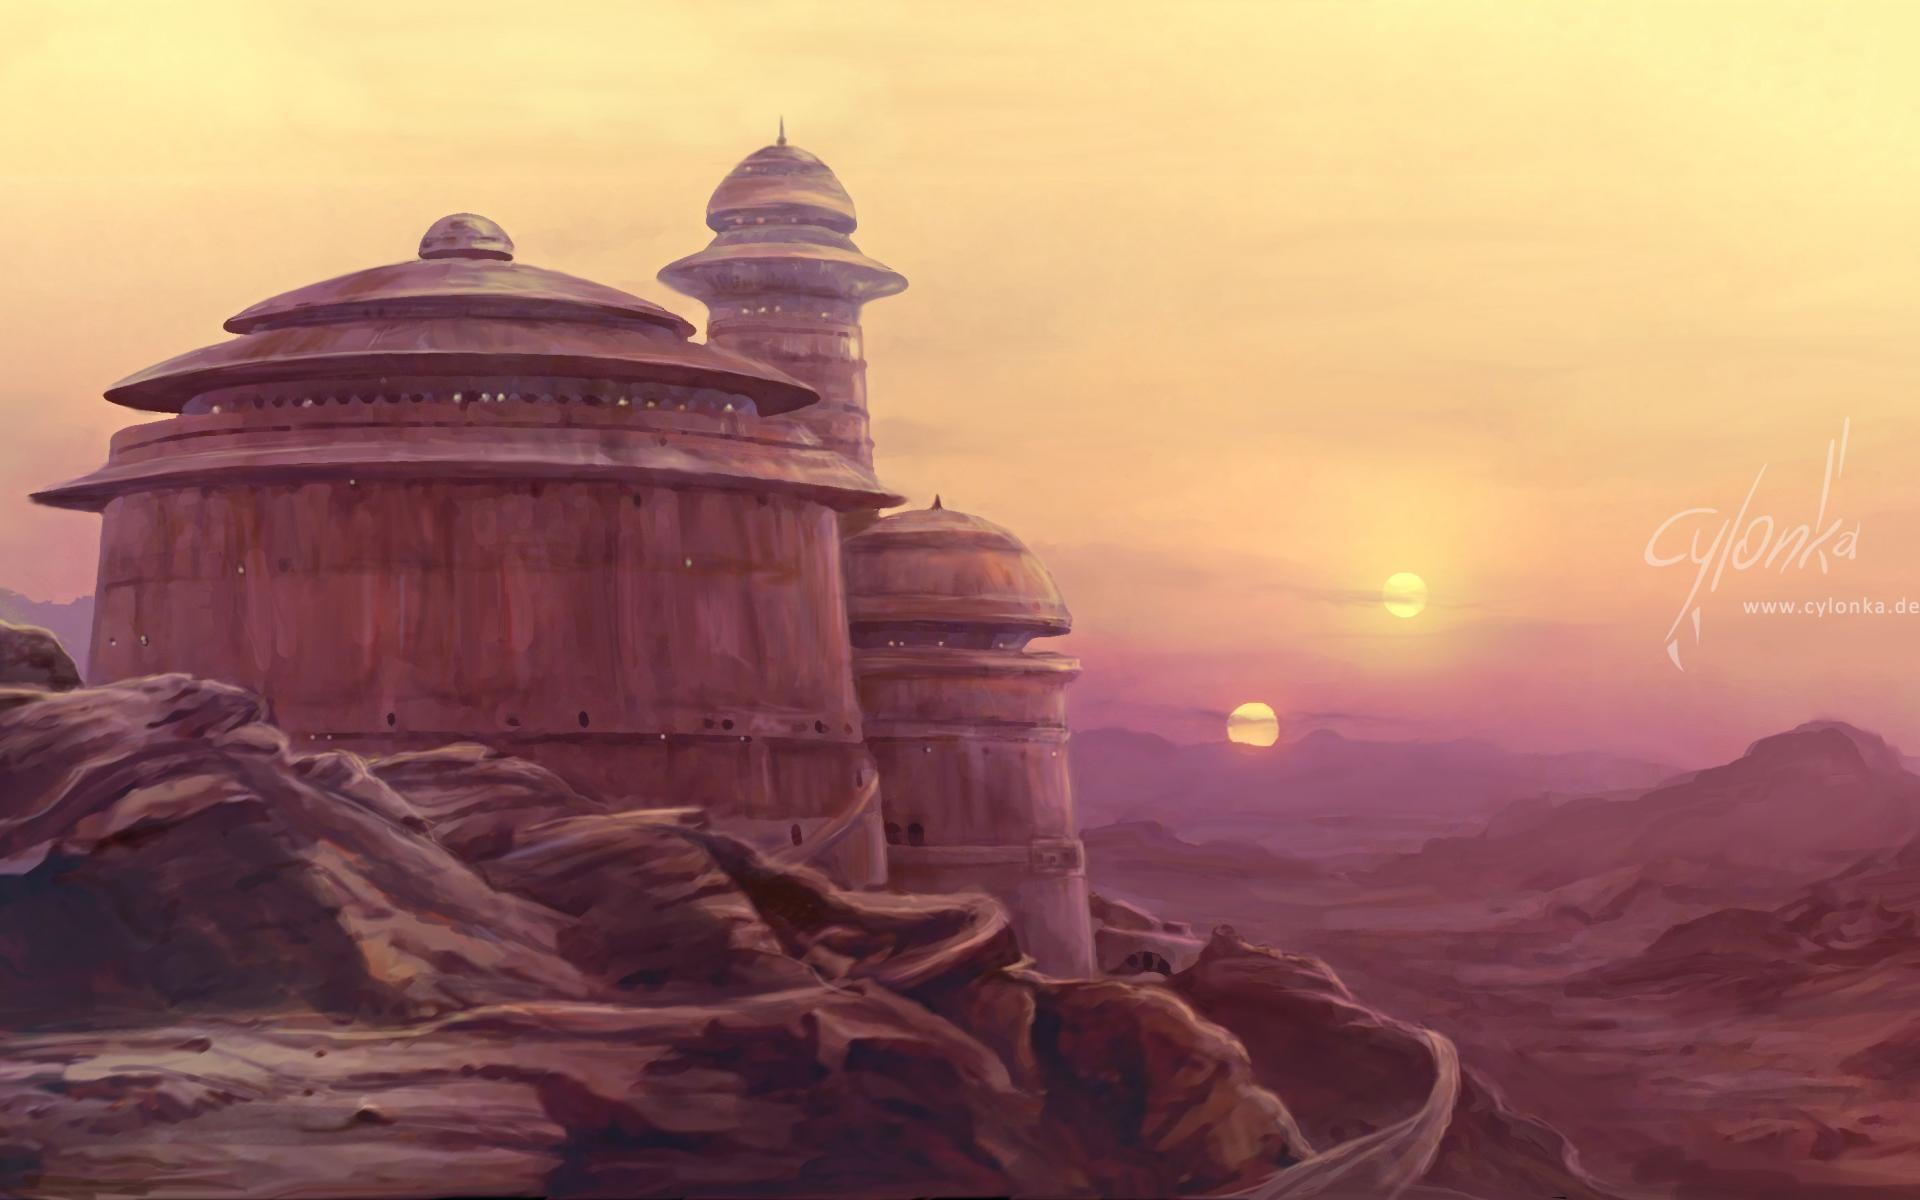 jabba-the-hutt-palace-wallpaper · Jabba's PalaceStar Wars …